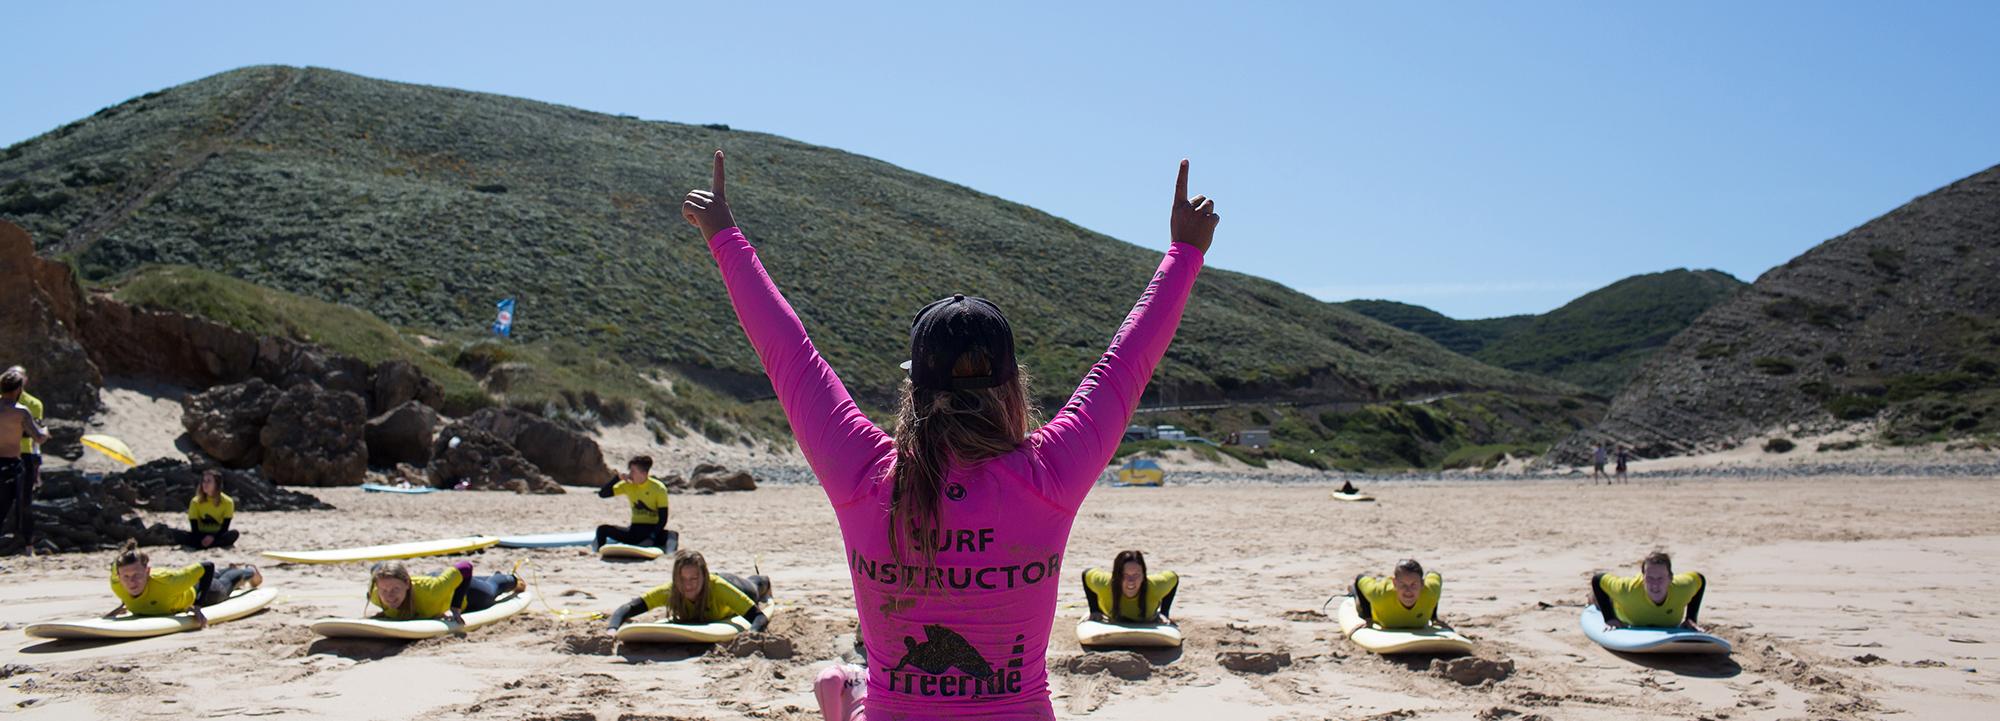 onelifelodge-surfcamp